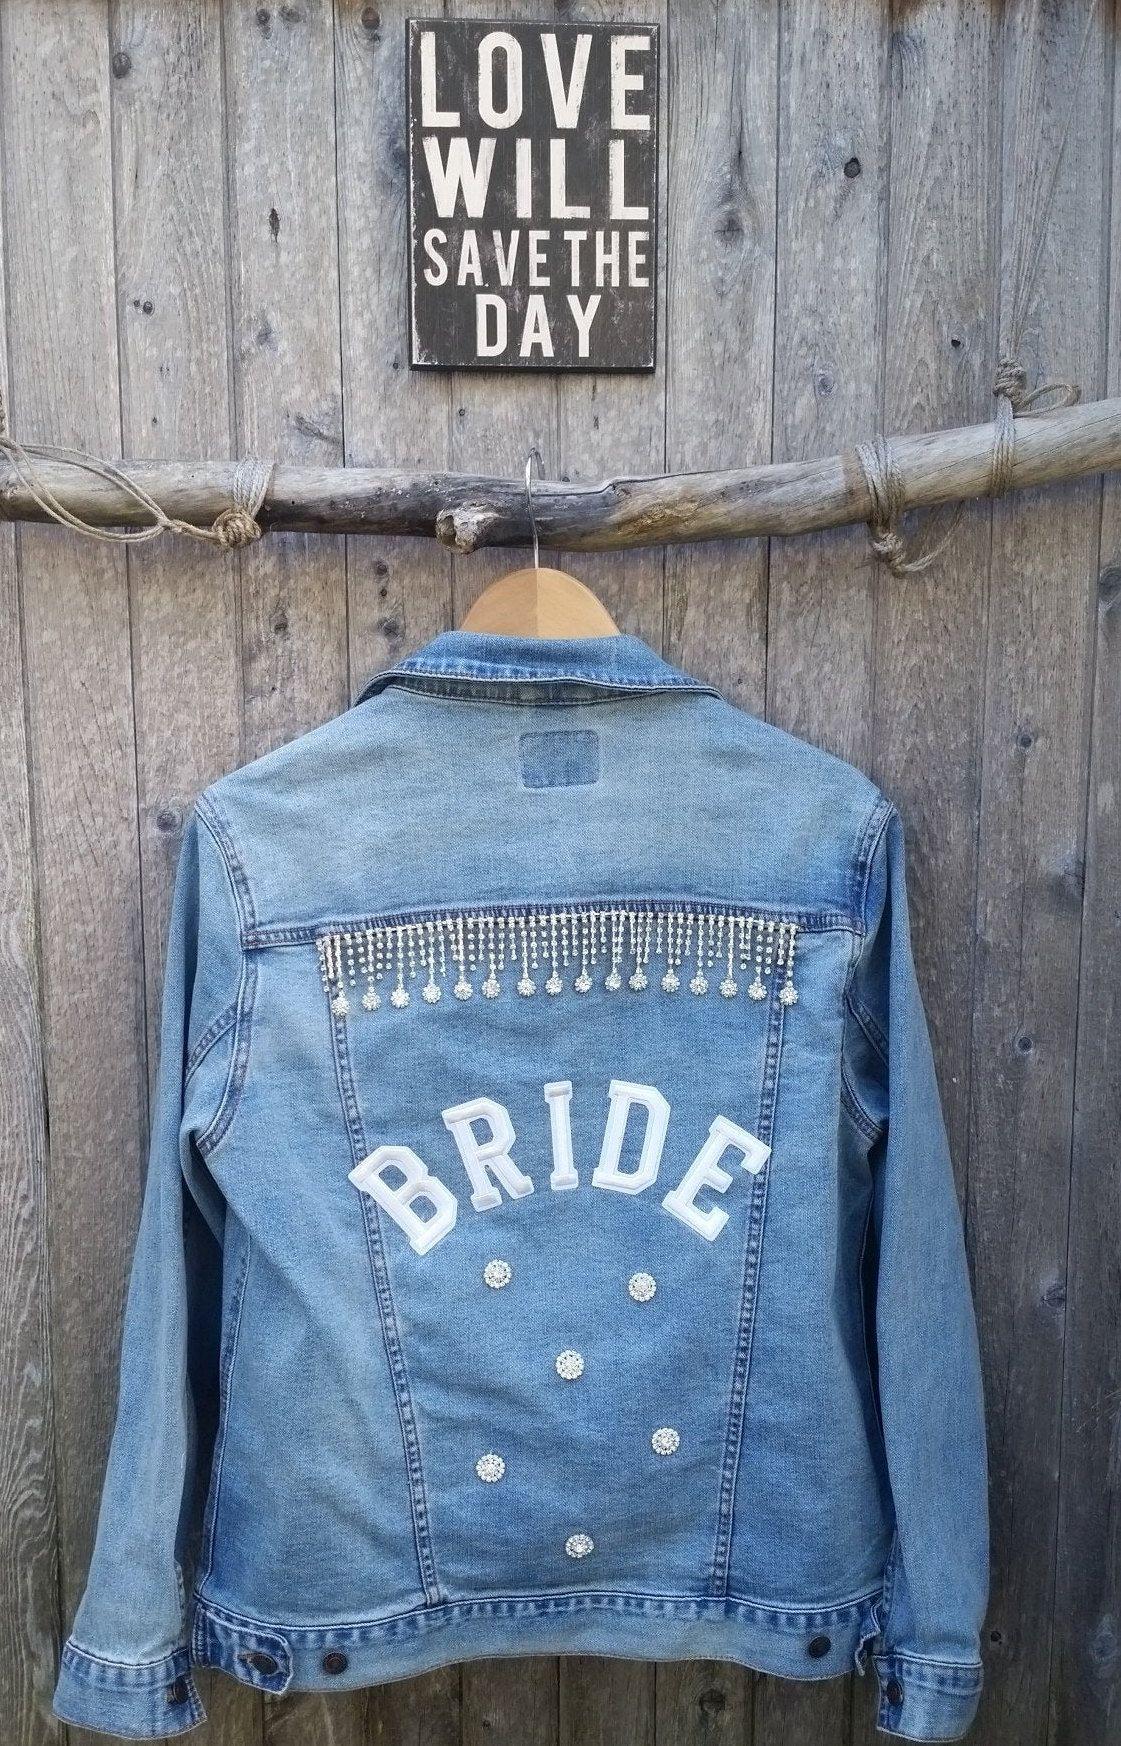 Bride Unisex Denim Wedding Jacket Bride Custom Denimjacket Wifey Denim Jacket Jackets For Bridesmaids Bride And Groom Denim Wedding Wedding Jacket Wifey Jacket [ 1746 x 1121 Pixel ]